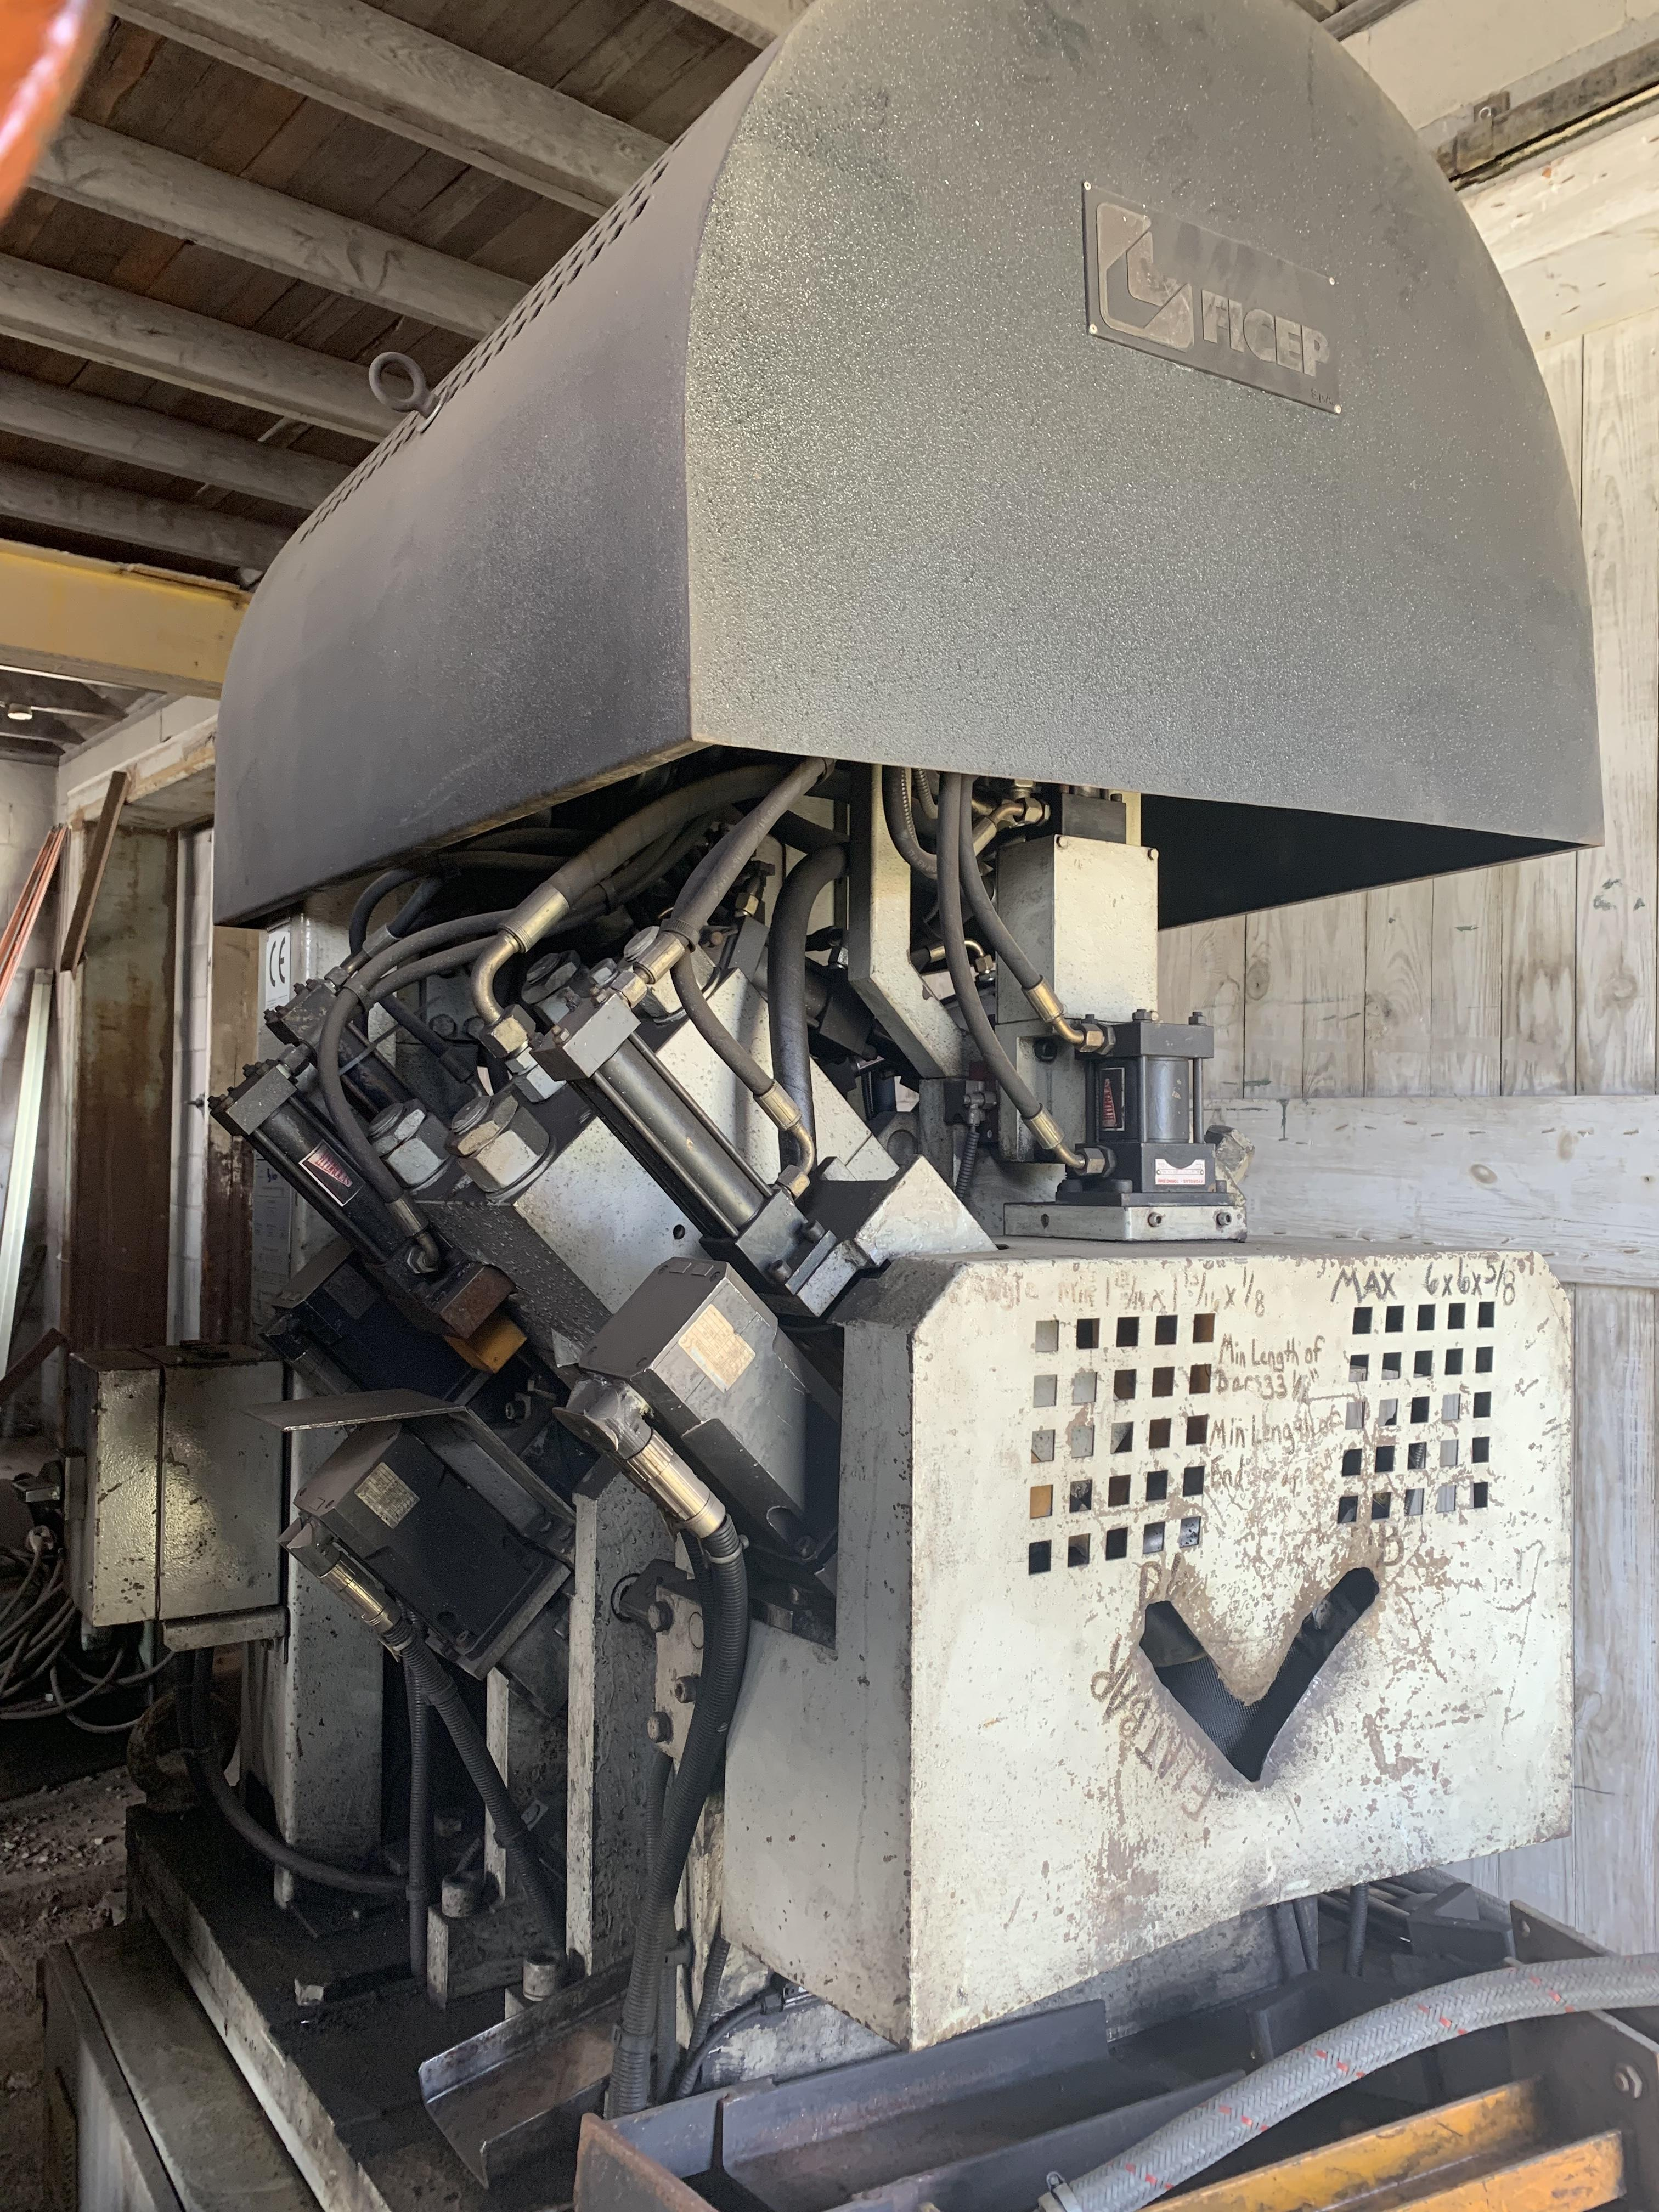 "4"" X 4"" X 1/2"" FICEP MODEL A102 CNC PUNCHING & SHEARING ANGLE LINE: STOCK #10797"